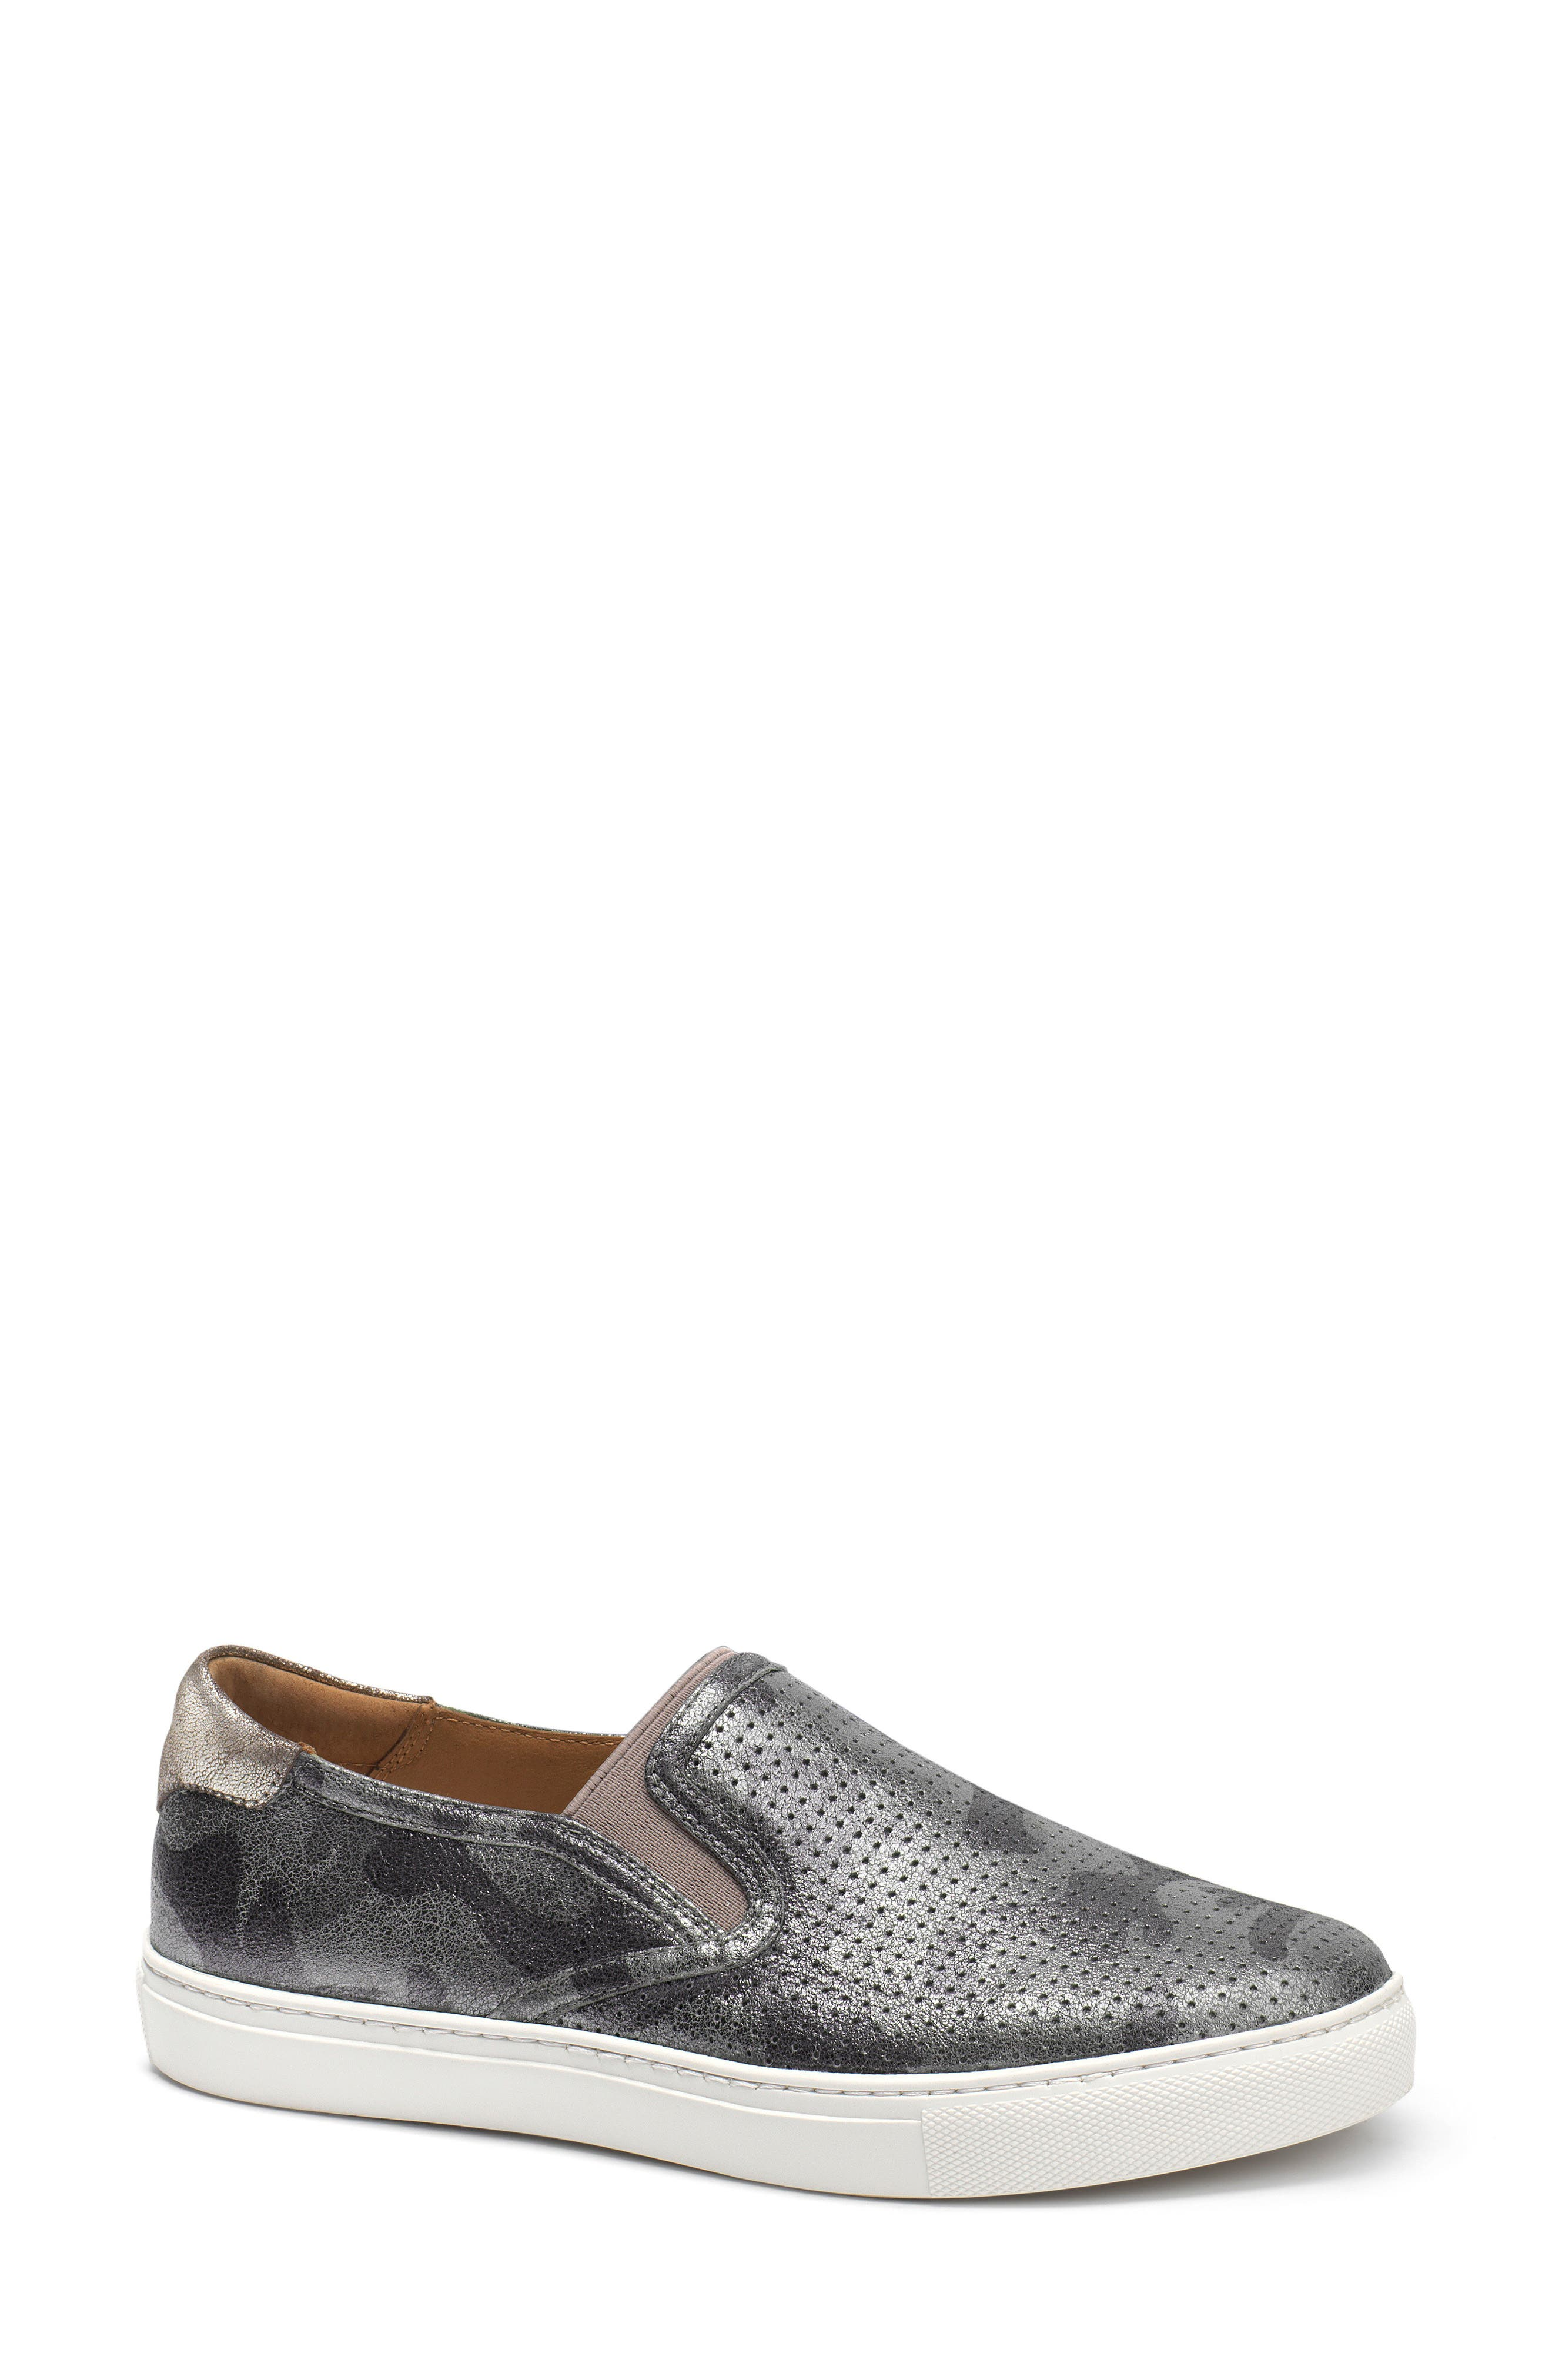 Trask Lillian Water Resistant Slip-On Sneaker, Metallic